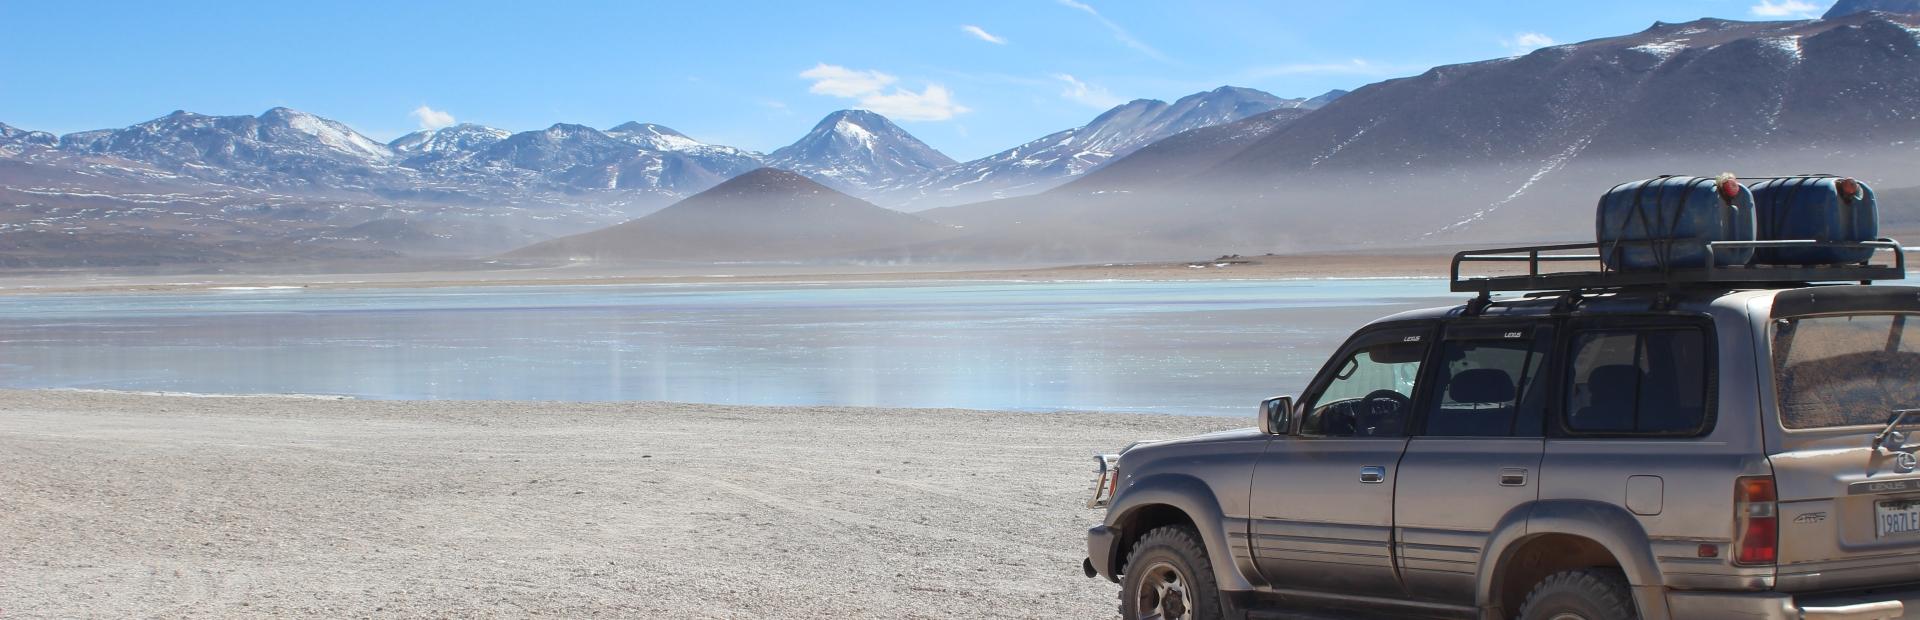 uyuni jeep tour